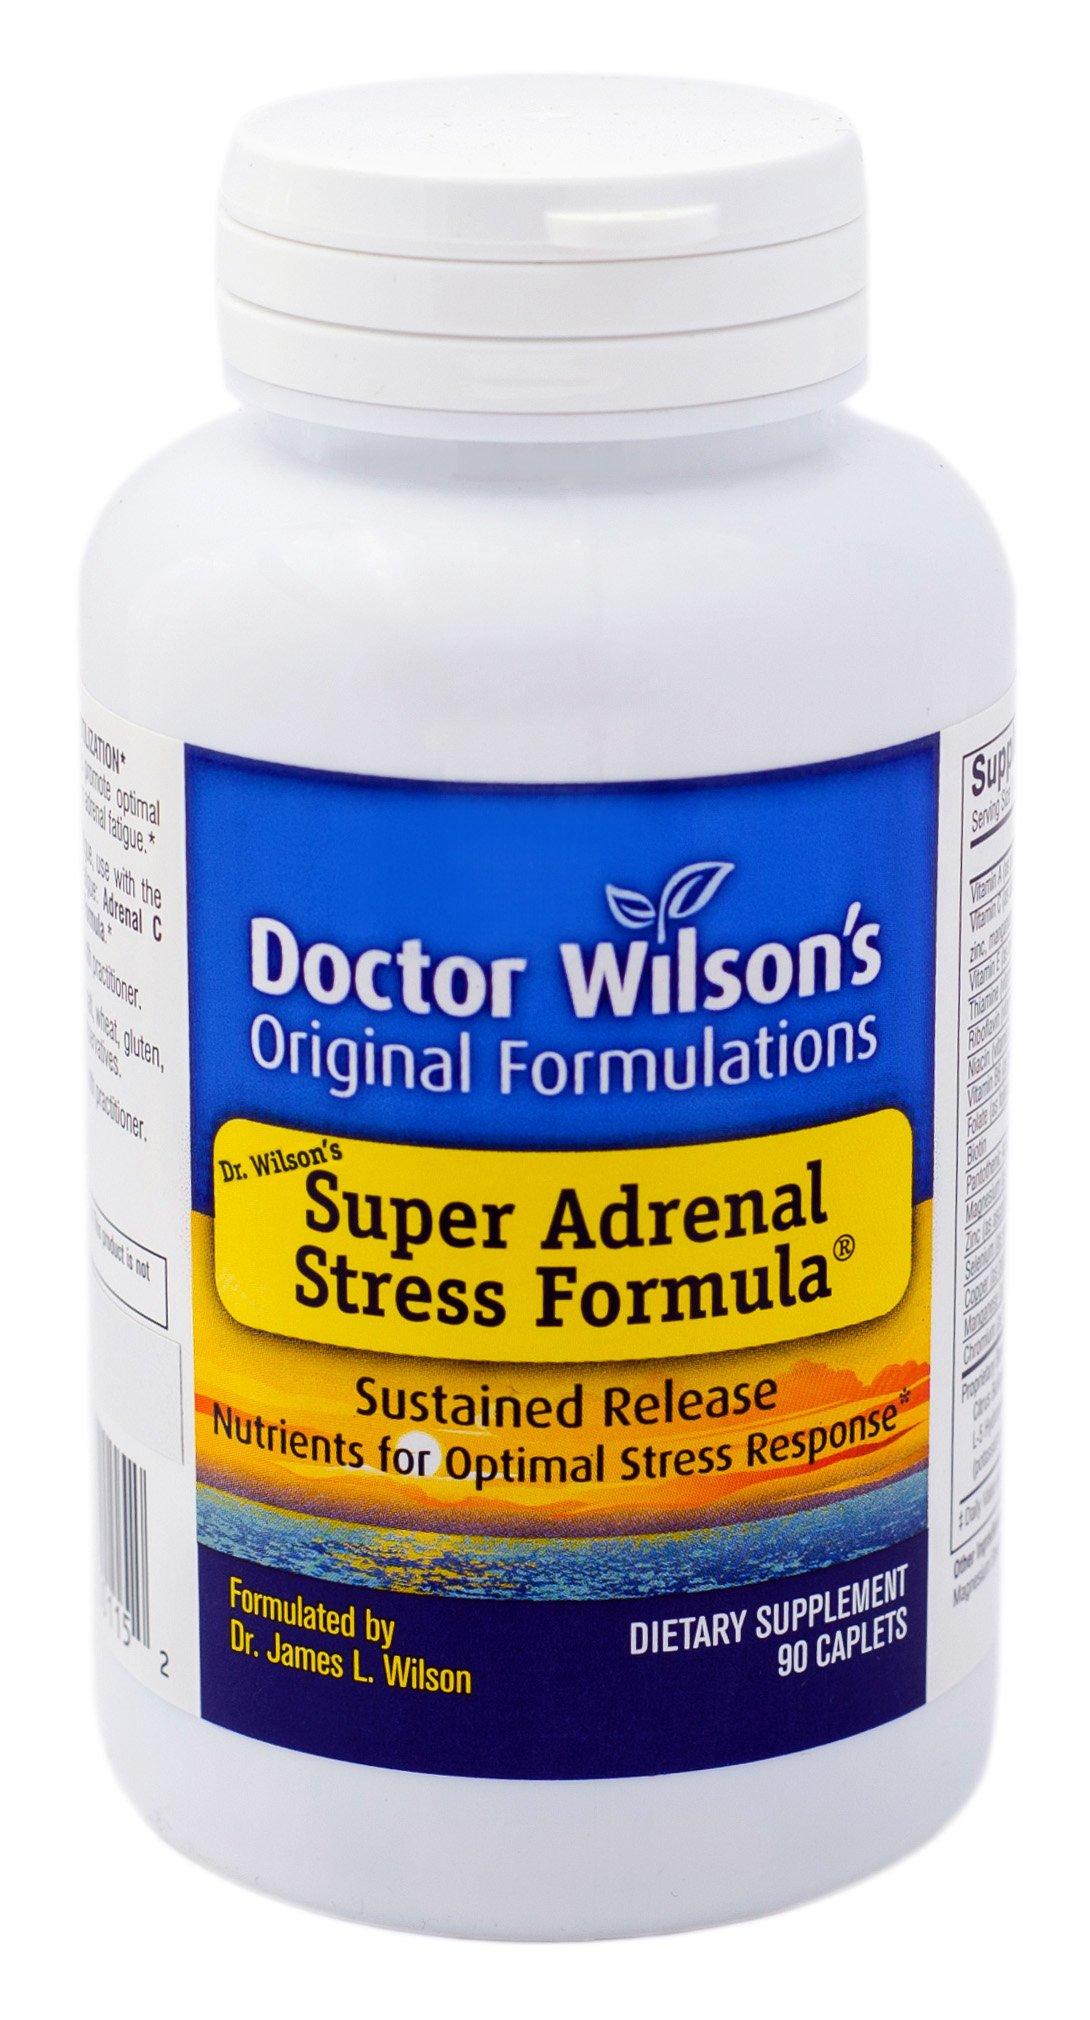 Doctor Wilson's Original Formulations Super Adrenal Stress Formula 90 caplets